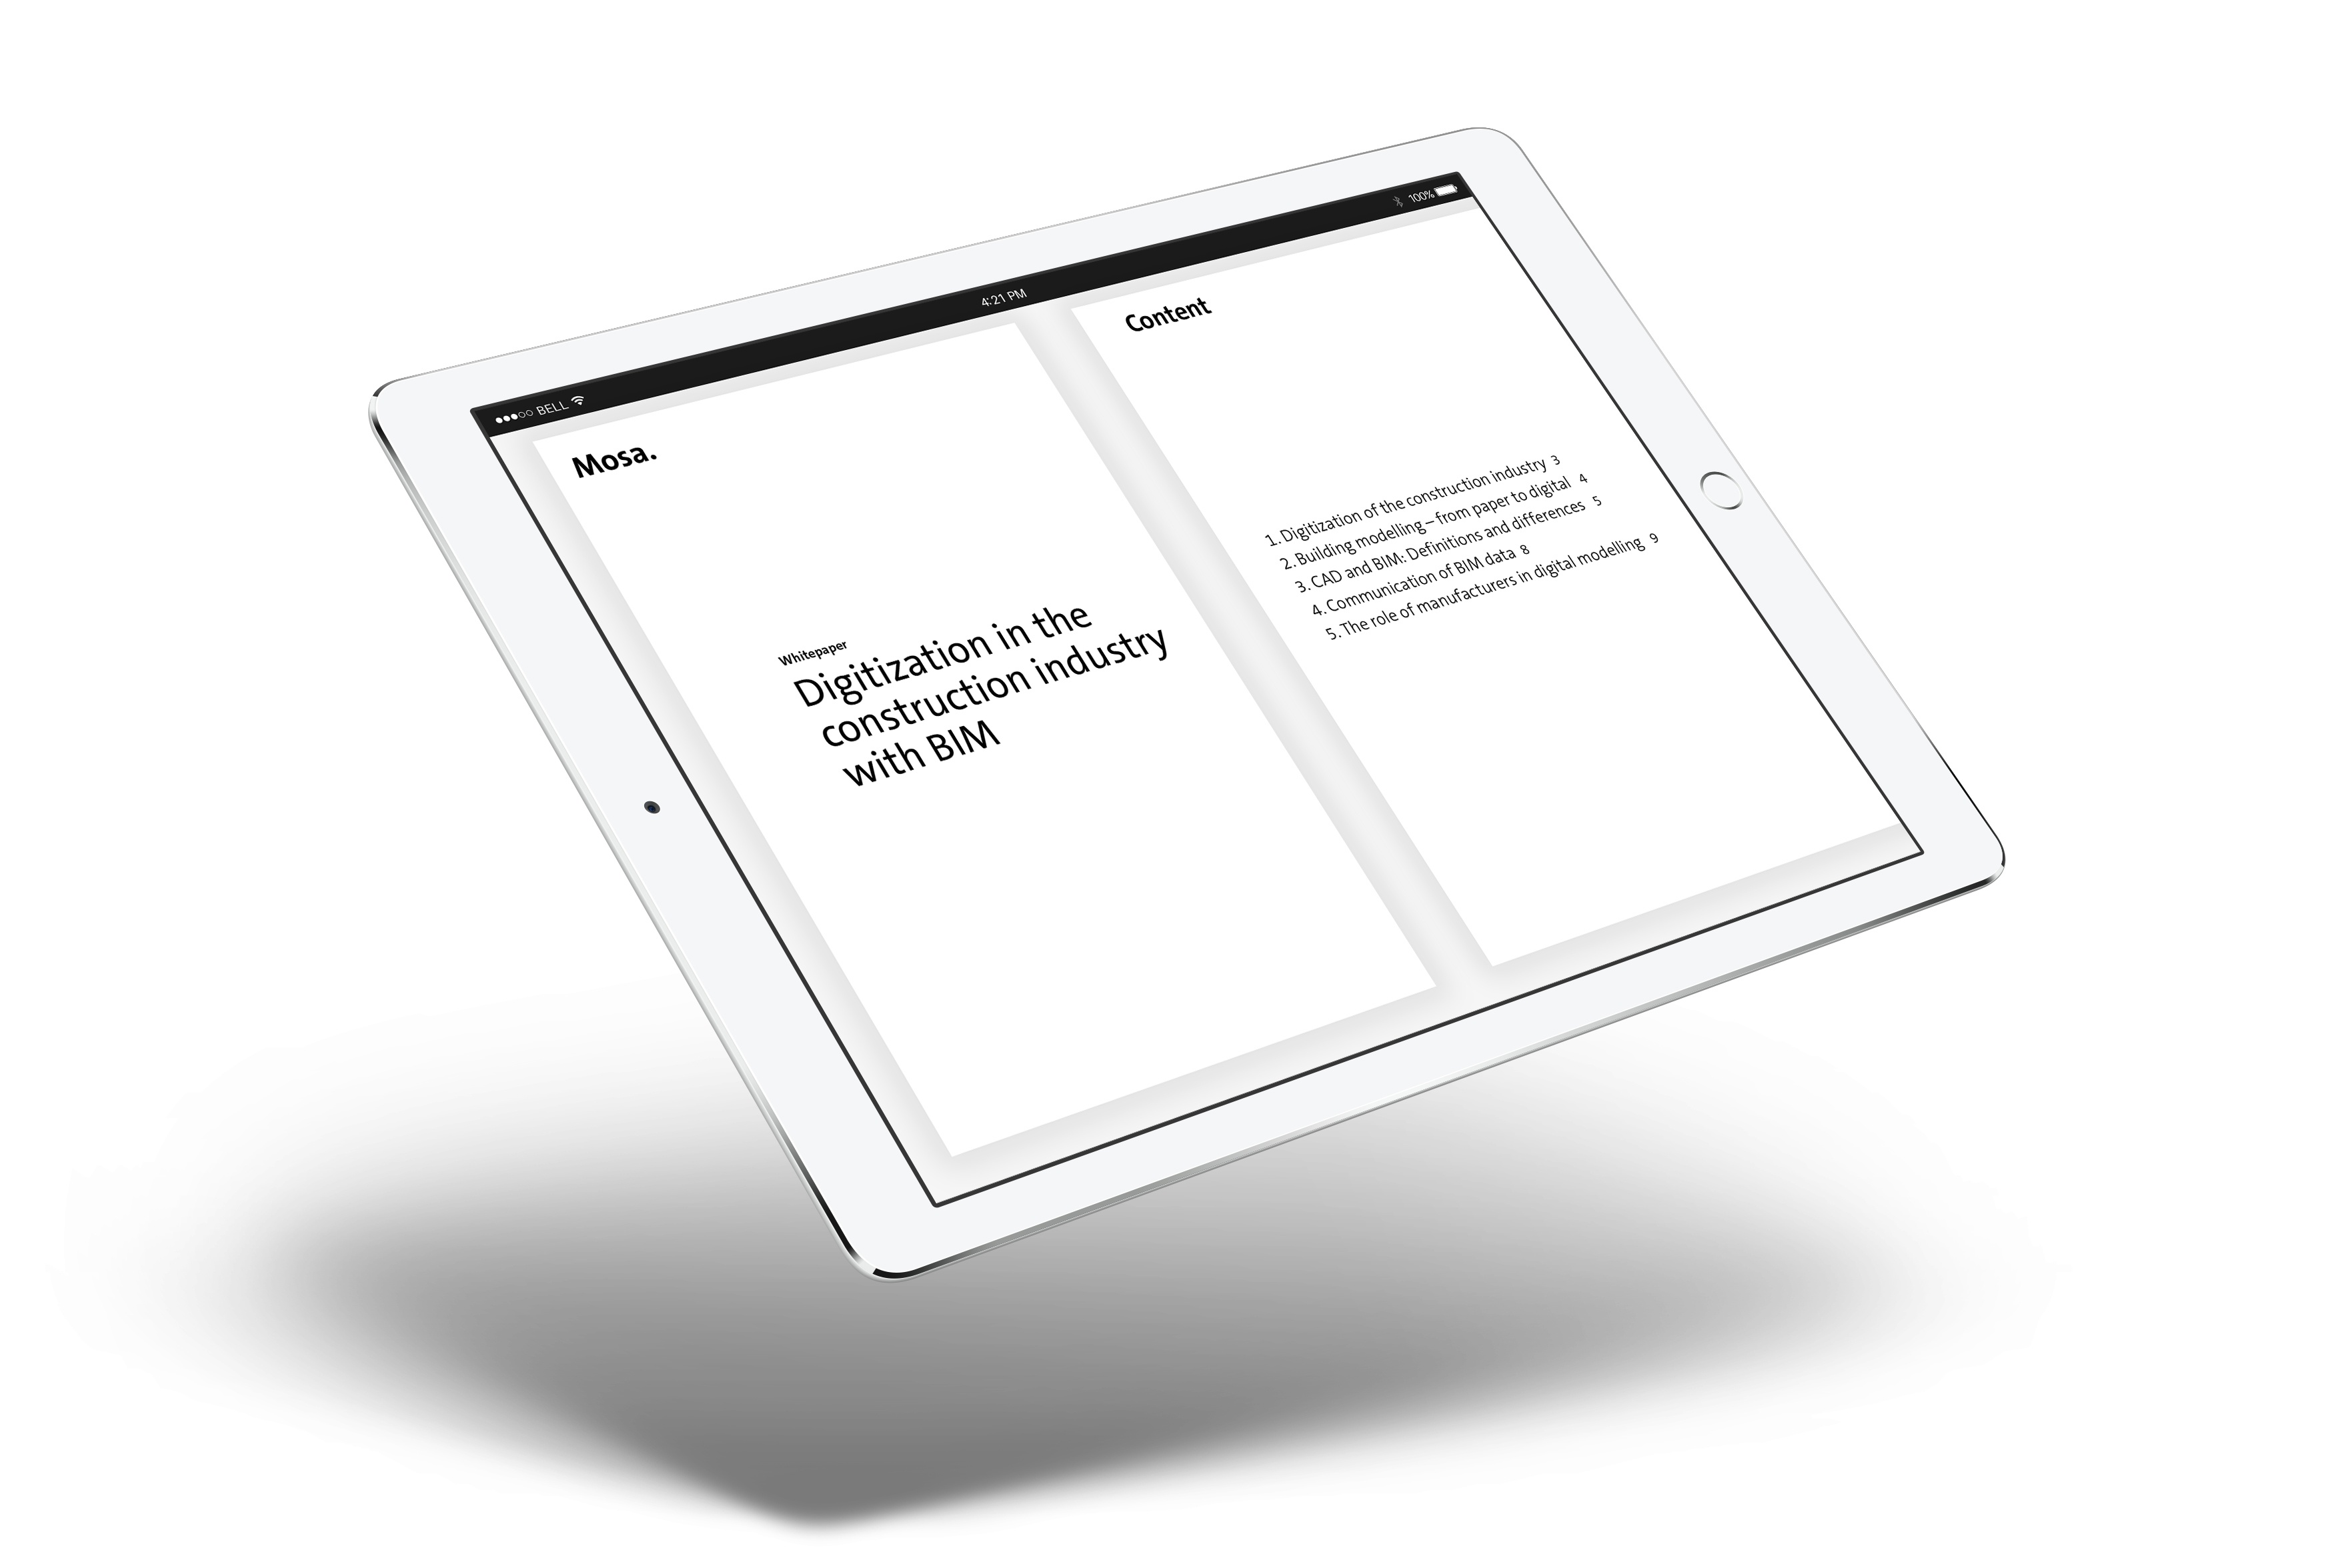 ENG-WHITEPAPER-iPad-Landscape.jpg